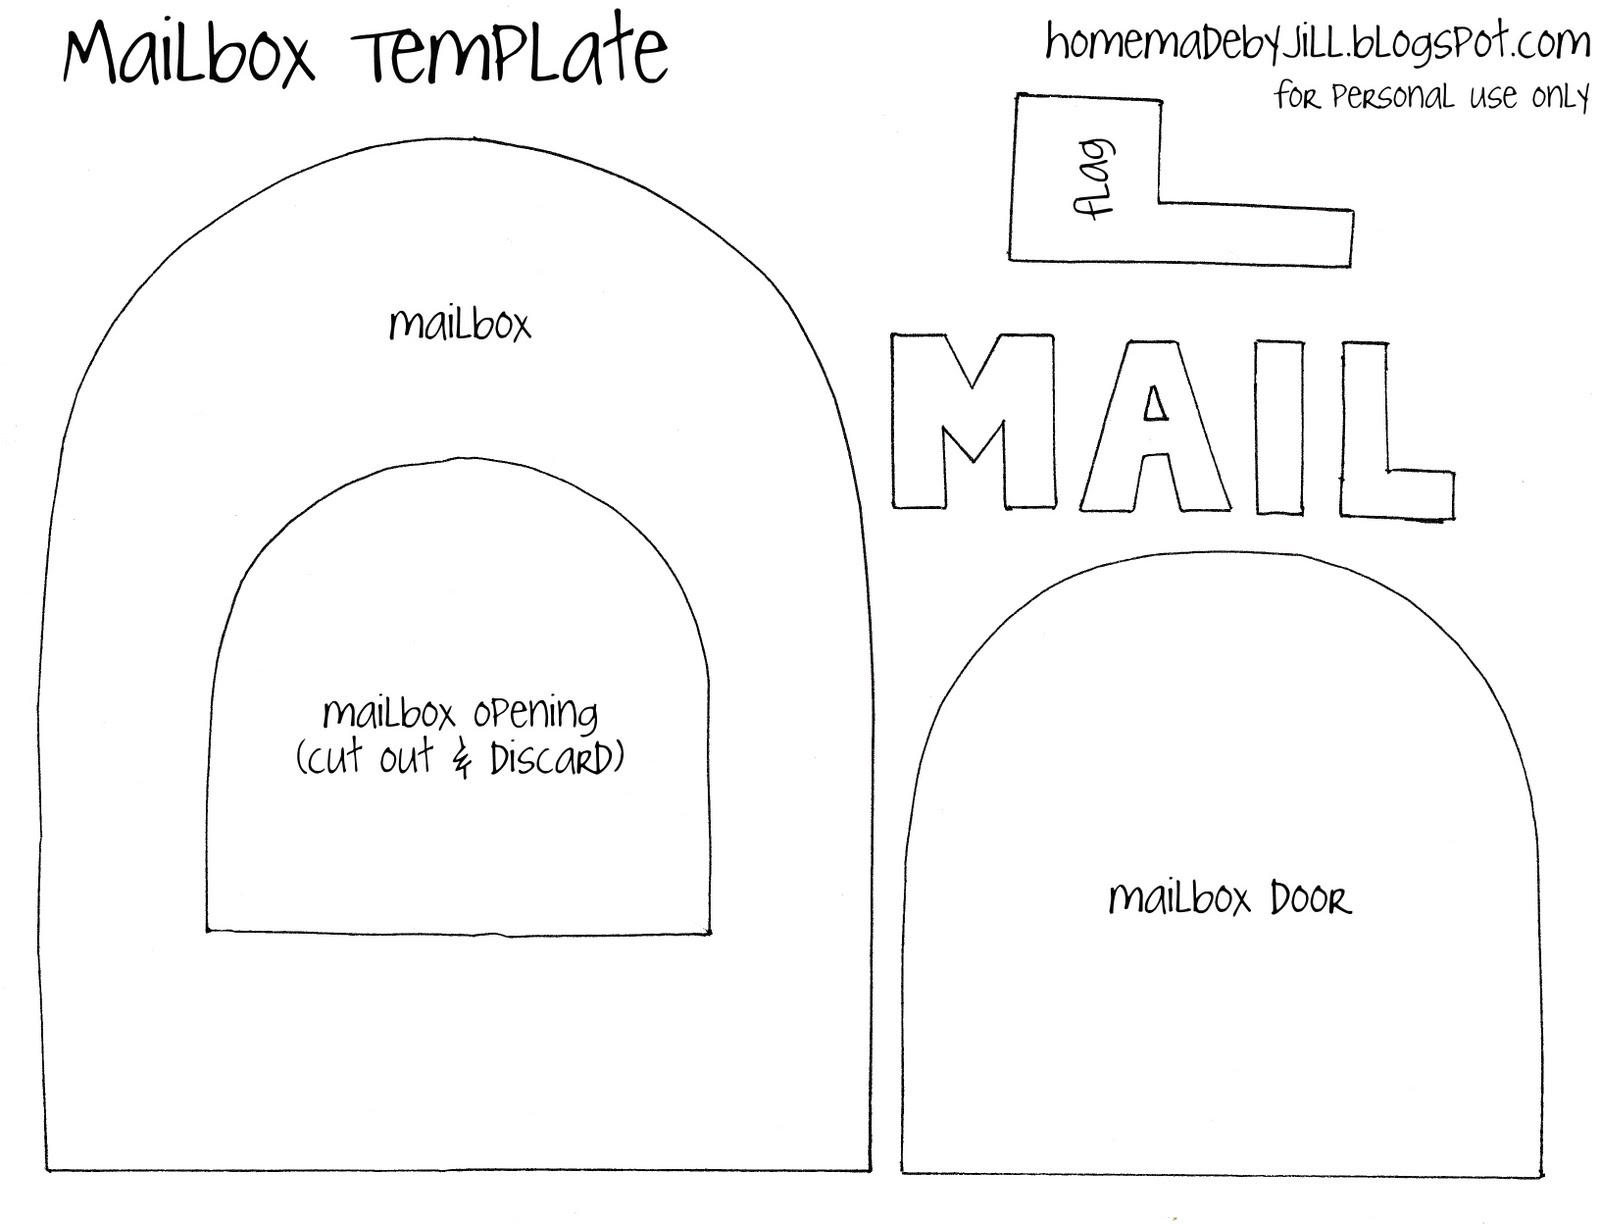 homemade by jill: Templates & Printables